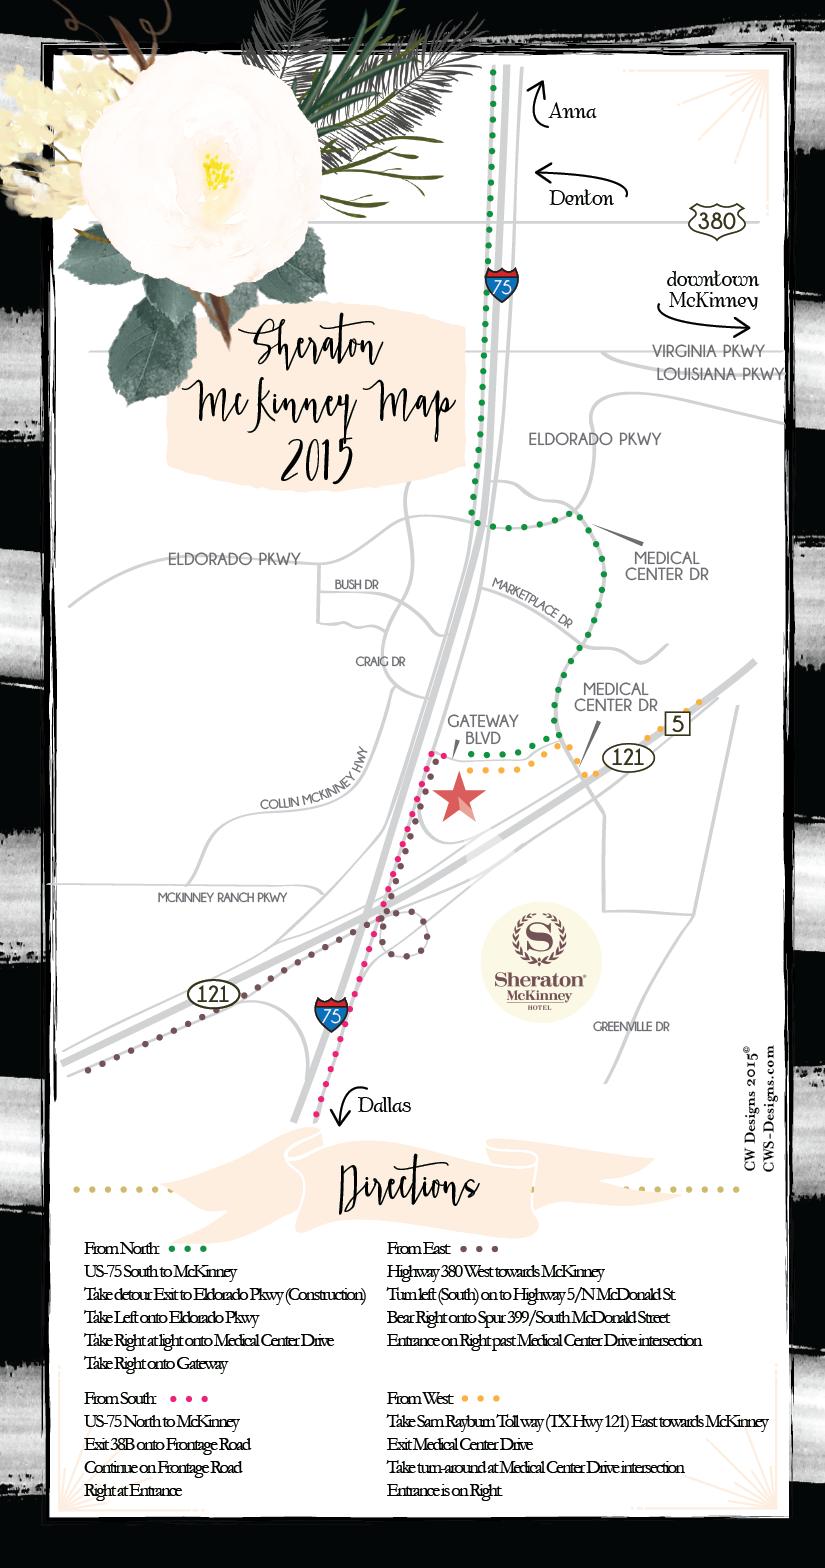 McKinney Sheraton Map - Social B-01.png